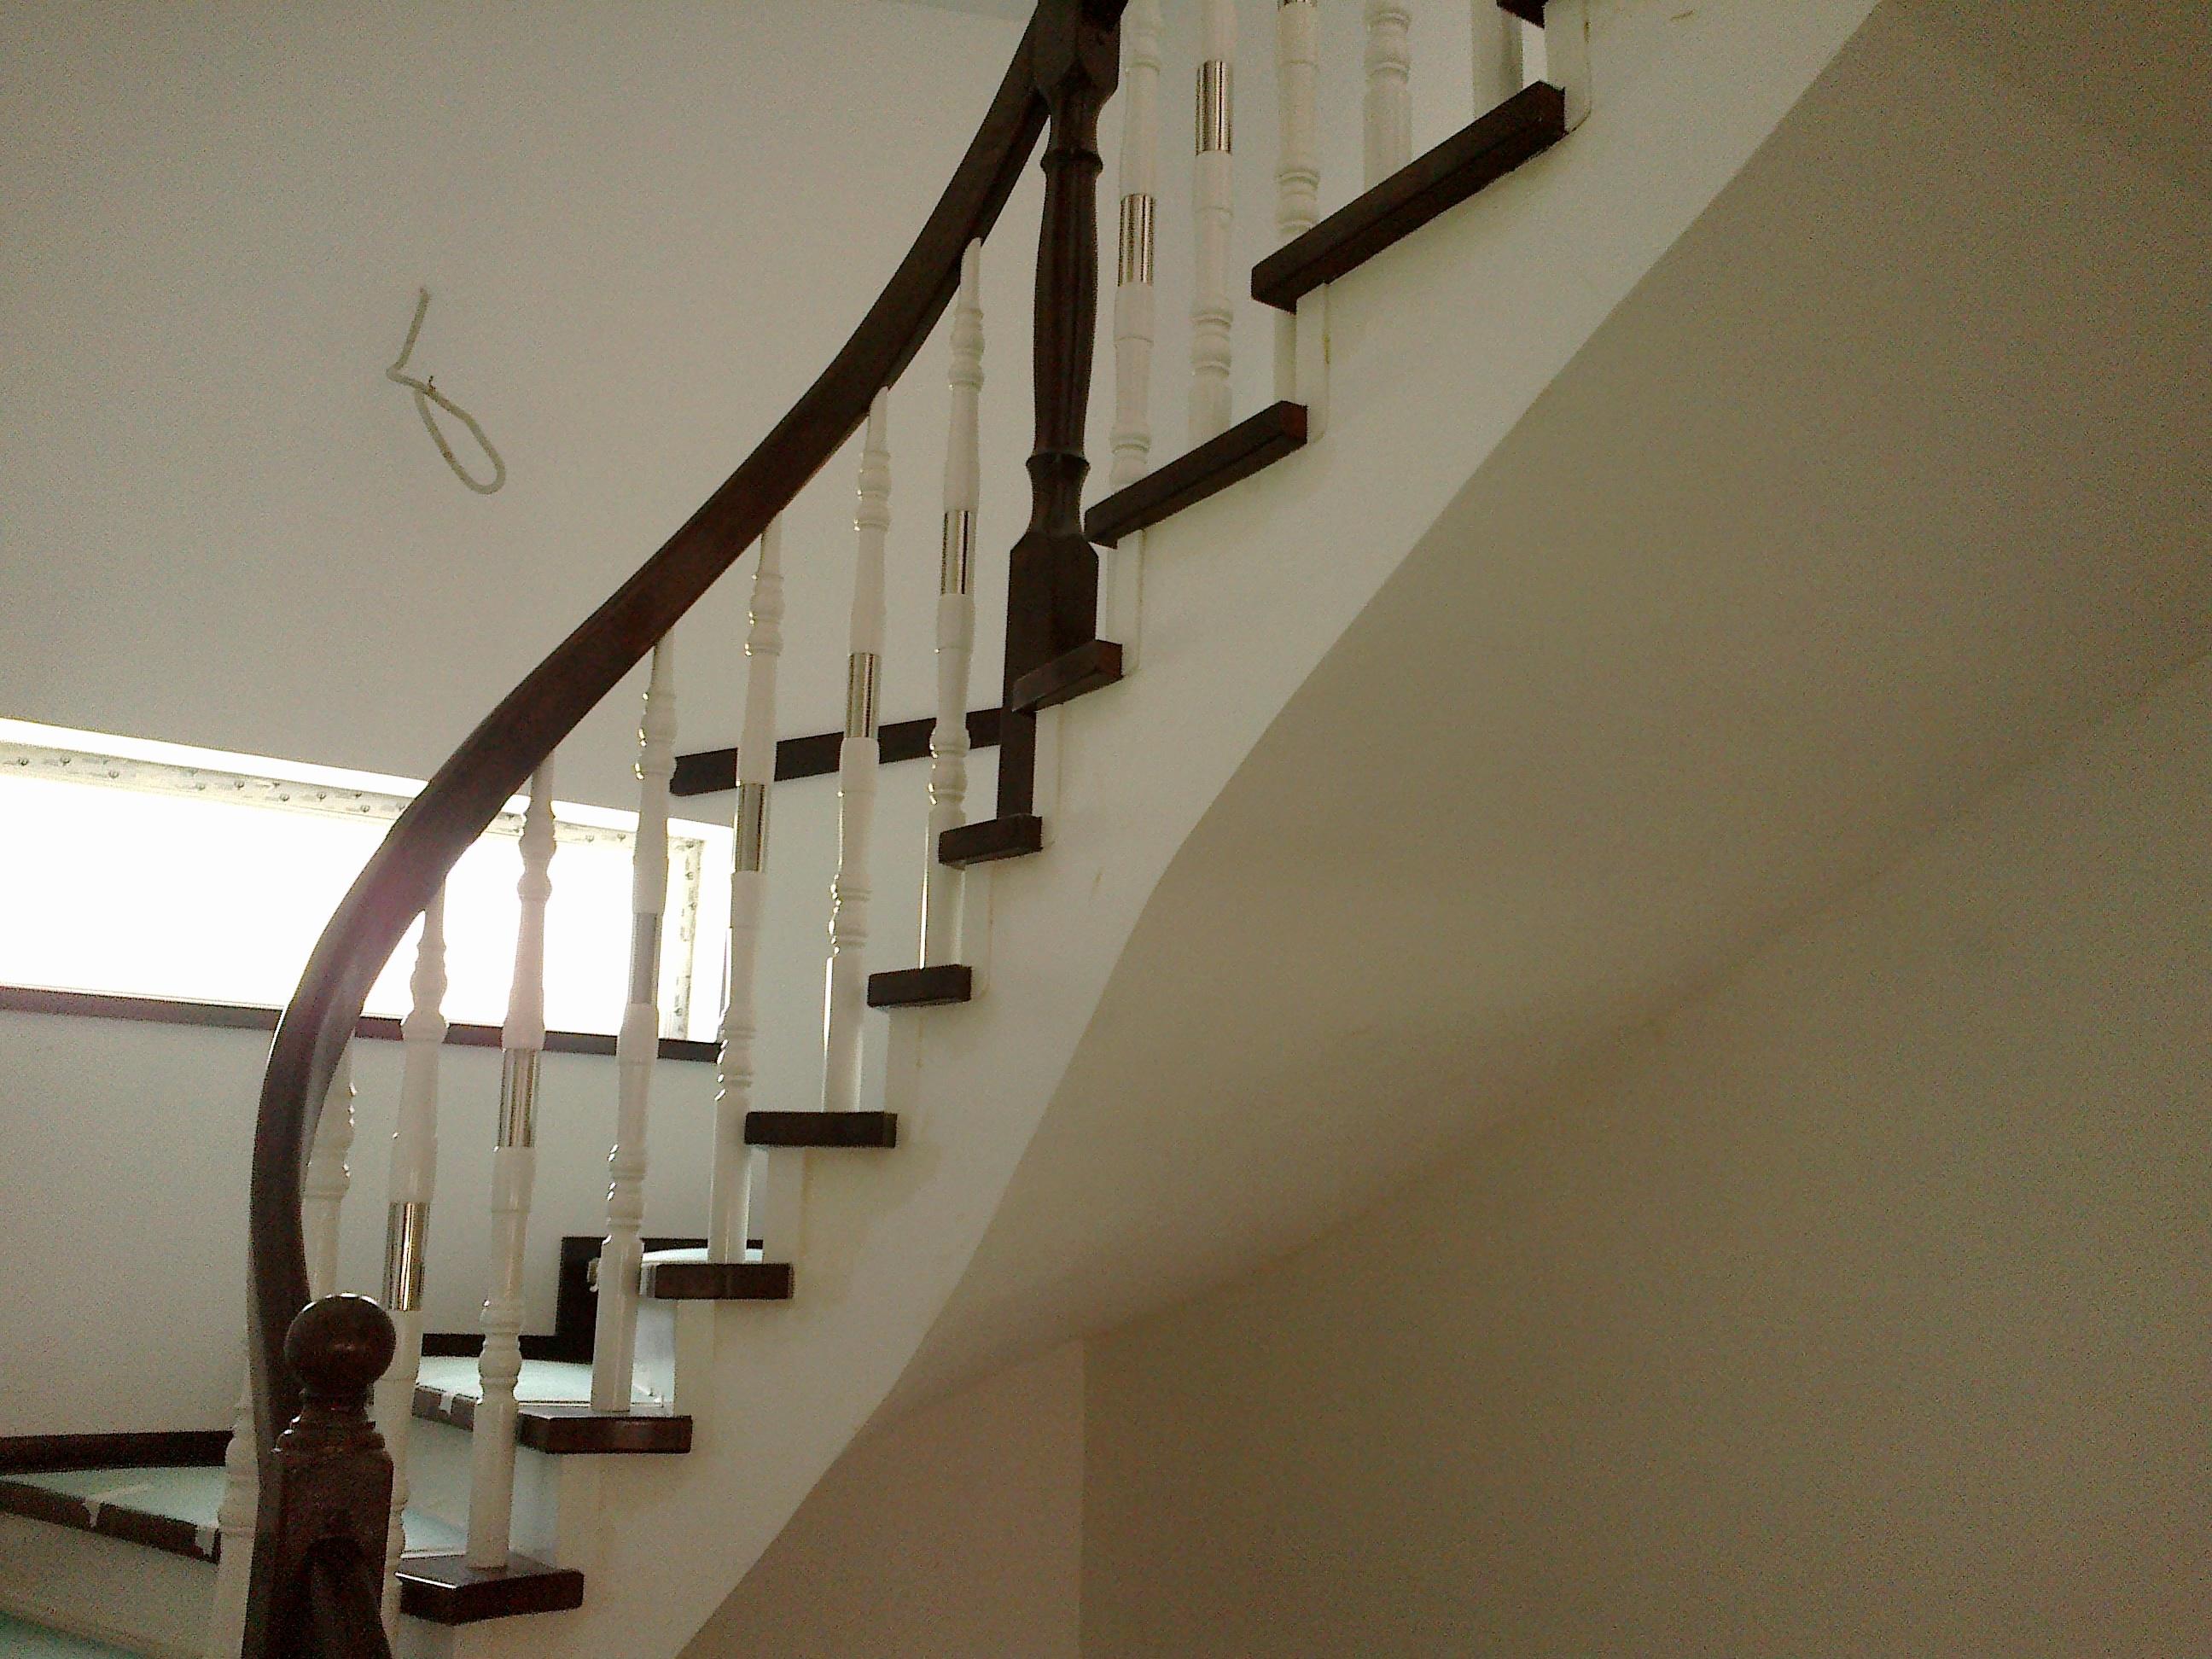 Trepte si Balustrada din lemn - Scara din beton balansata TURSO HOLZ - Poza 8